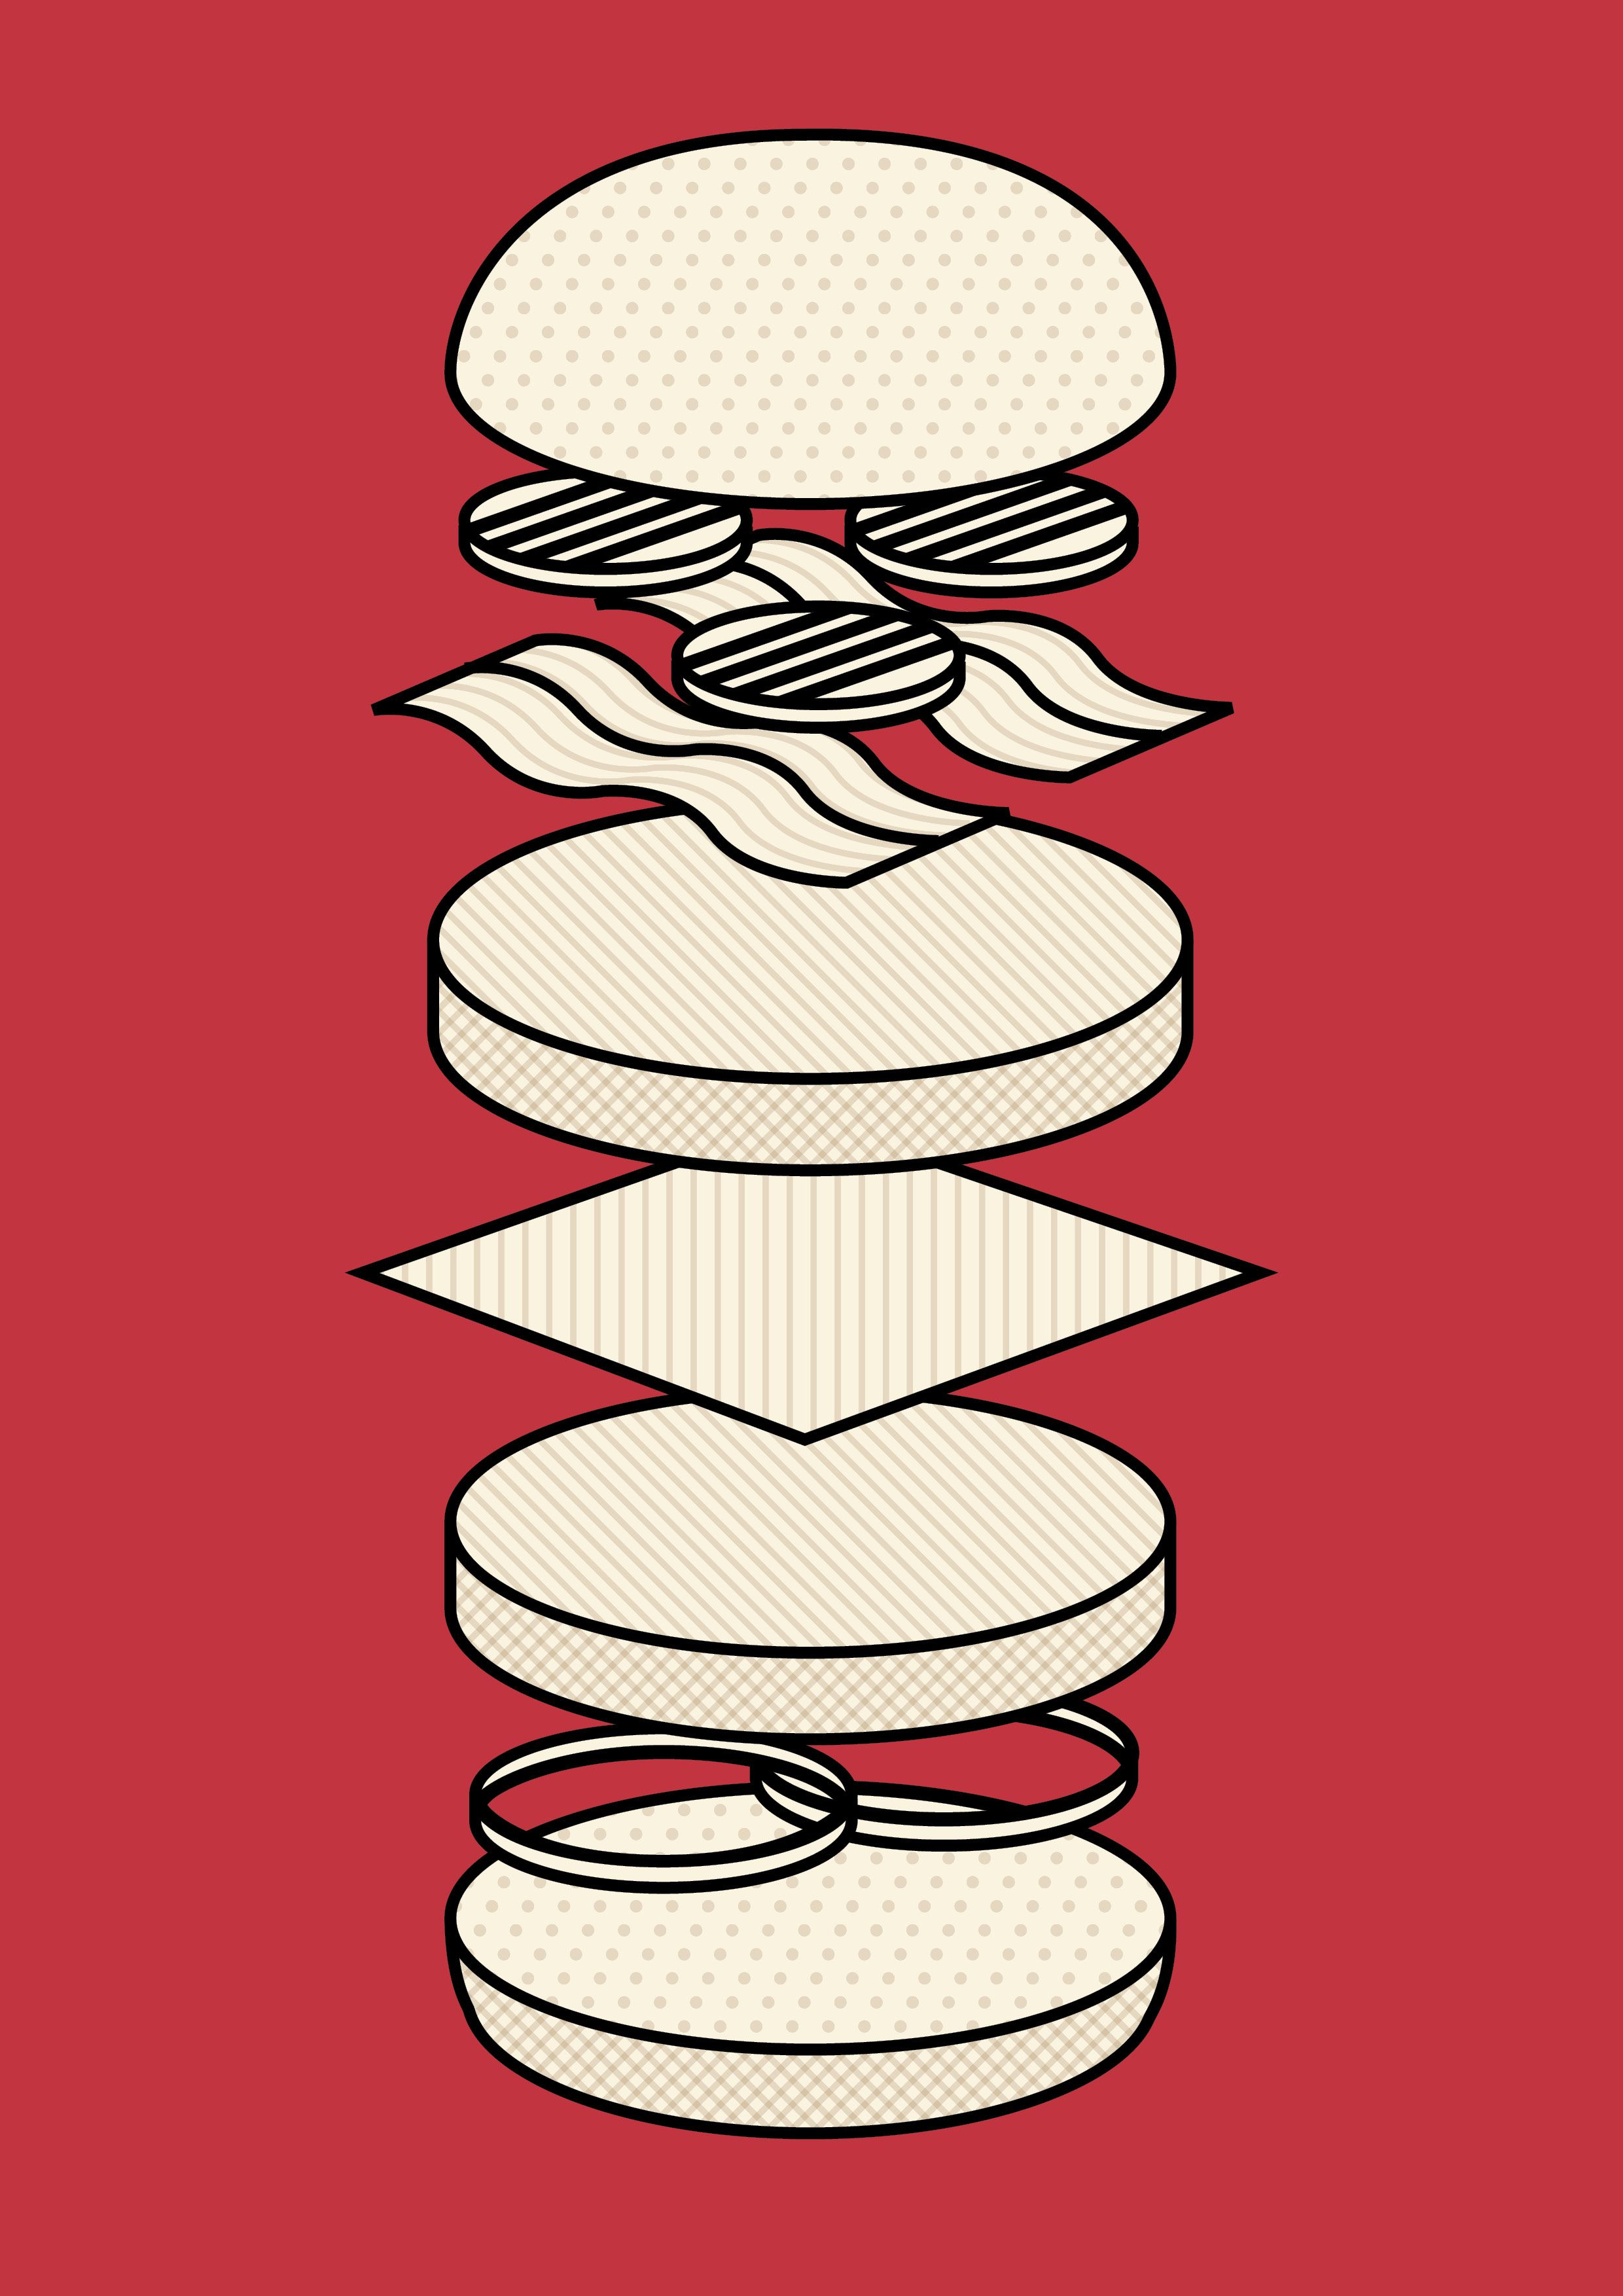 Burger clipart deconstructed. Illustration freelance graphic designer